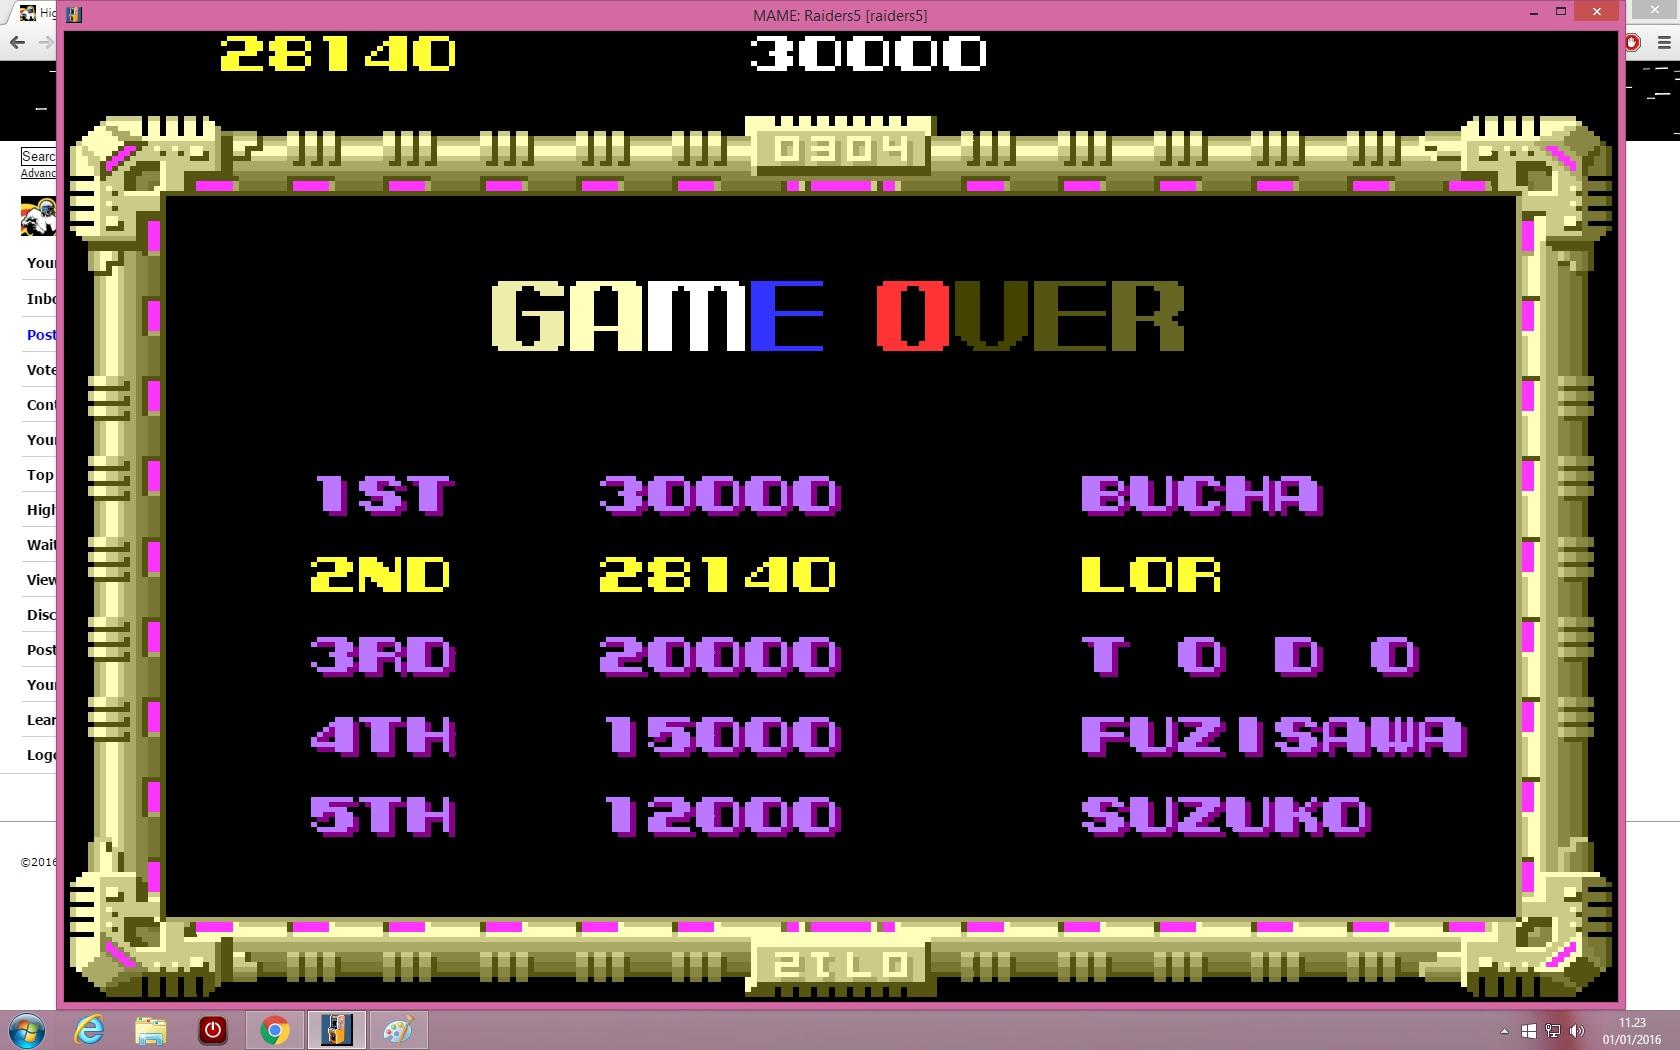 lenny2571: Raiders5 [raiders5] (Arcade Emulated / M.A.M.E.) 28,140 points on 2016-01-01 04:24:08